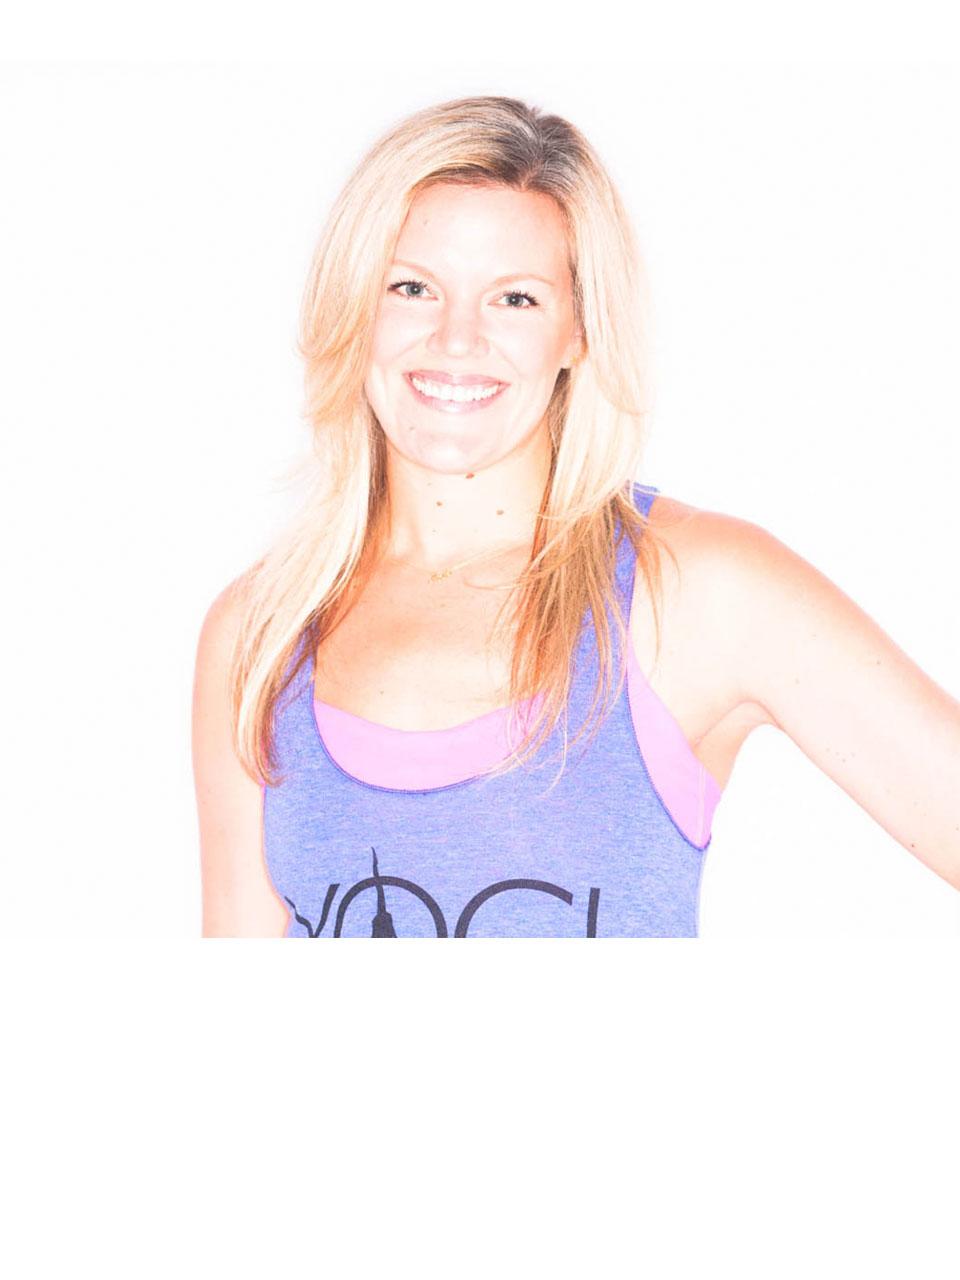 Amber Stratton